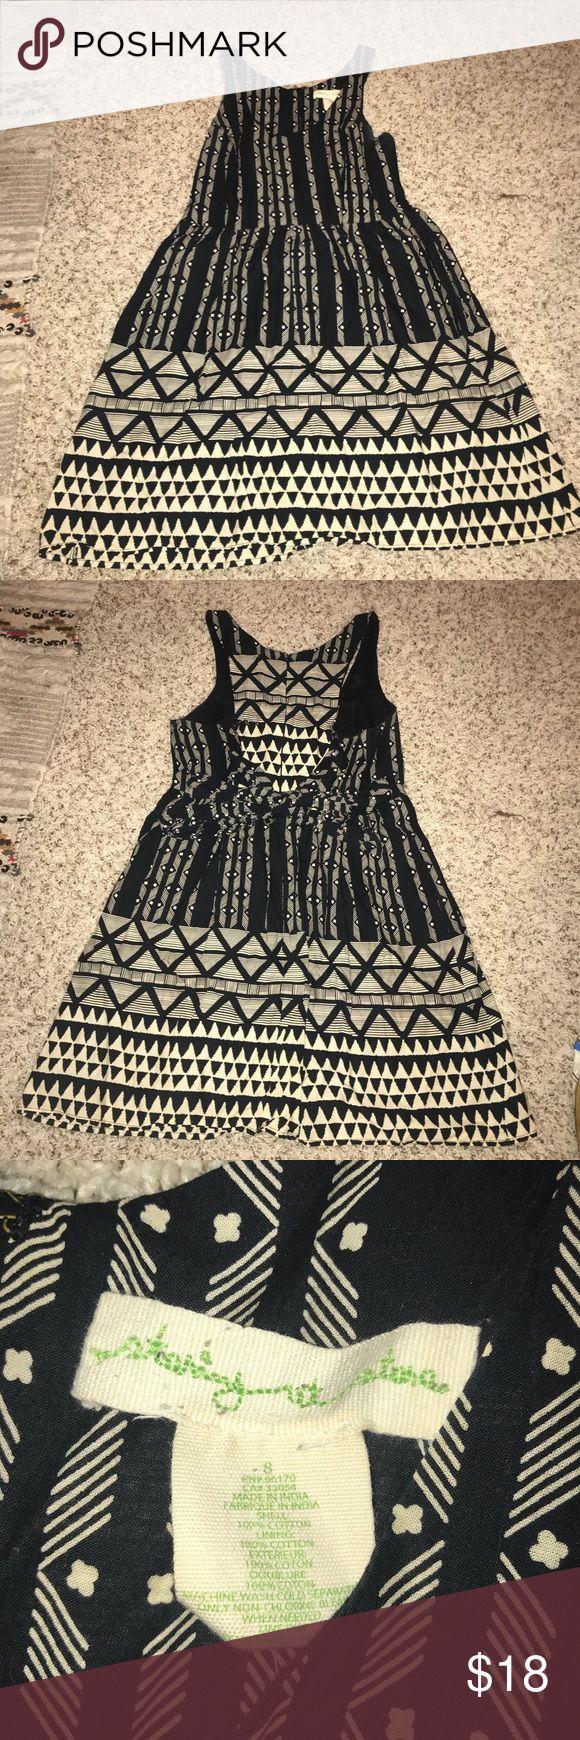 Aztec printed dress Size 8 but runs small fits like a medium. Perfect condition. Zipper still works. Dresses Midi